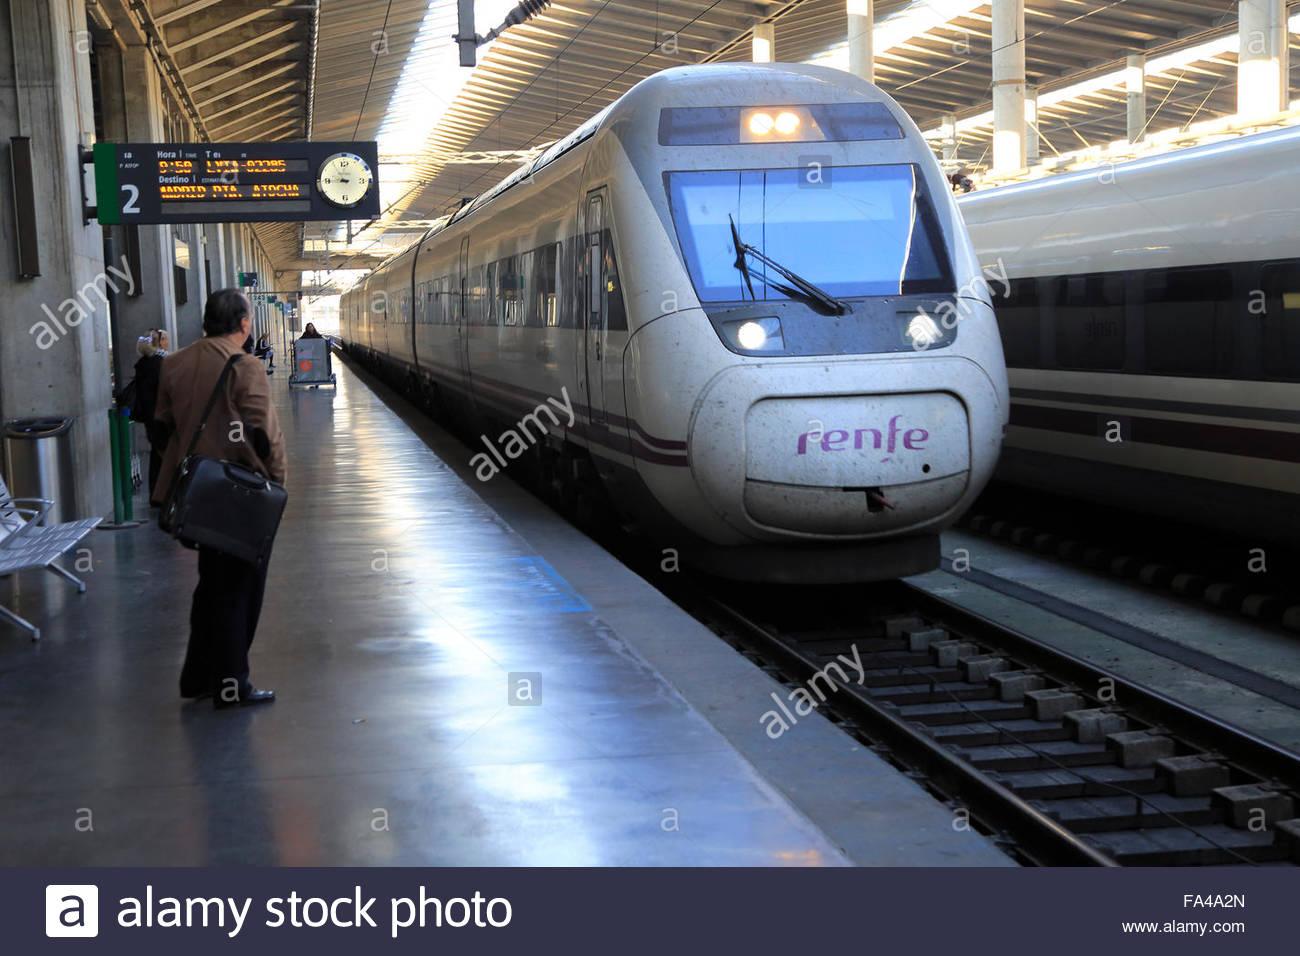 RENFE train at platform, Cordoba railway station, Spain - Stock Image